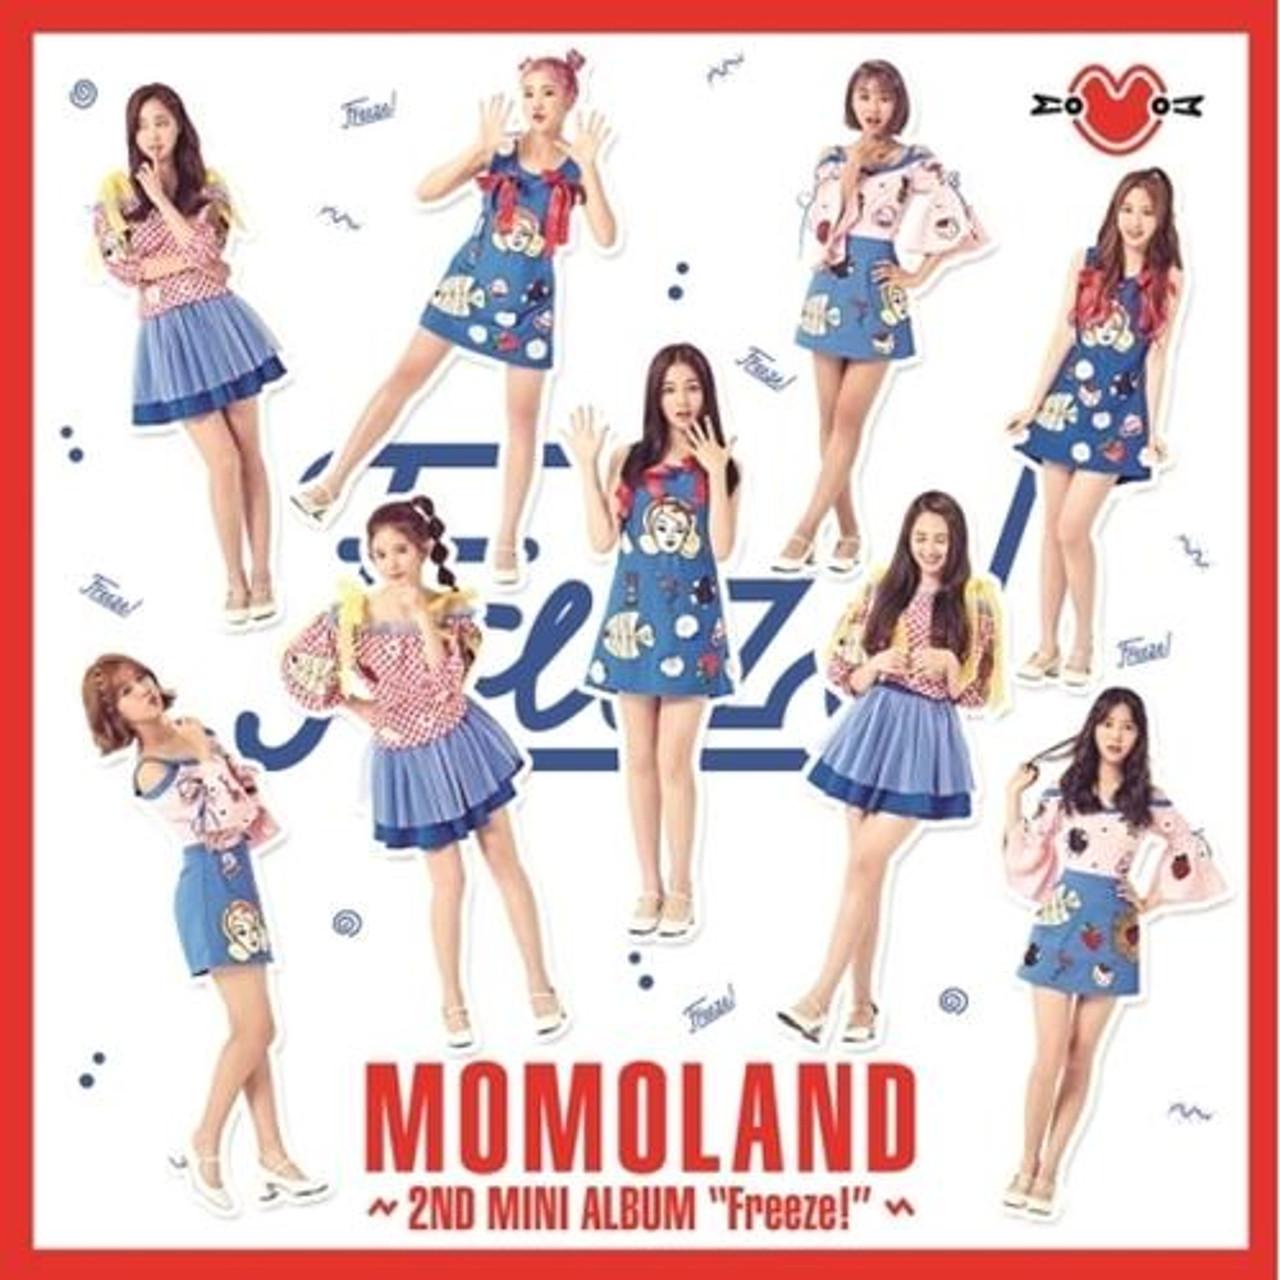 MOMOLAND - 2nd Mini